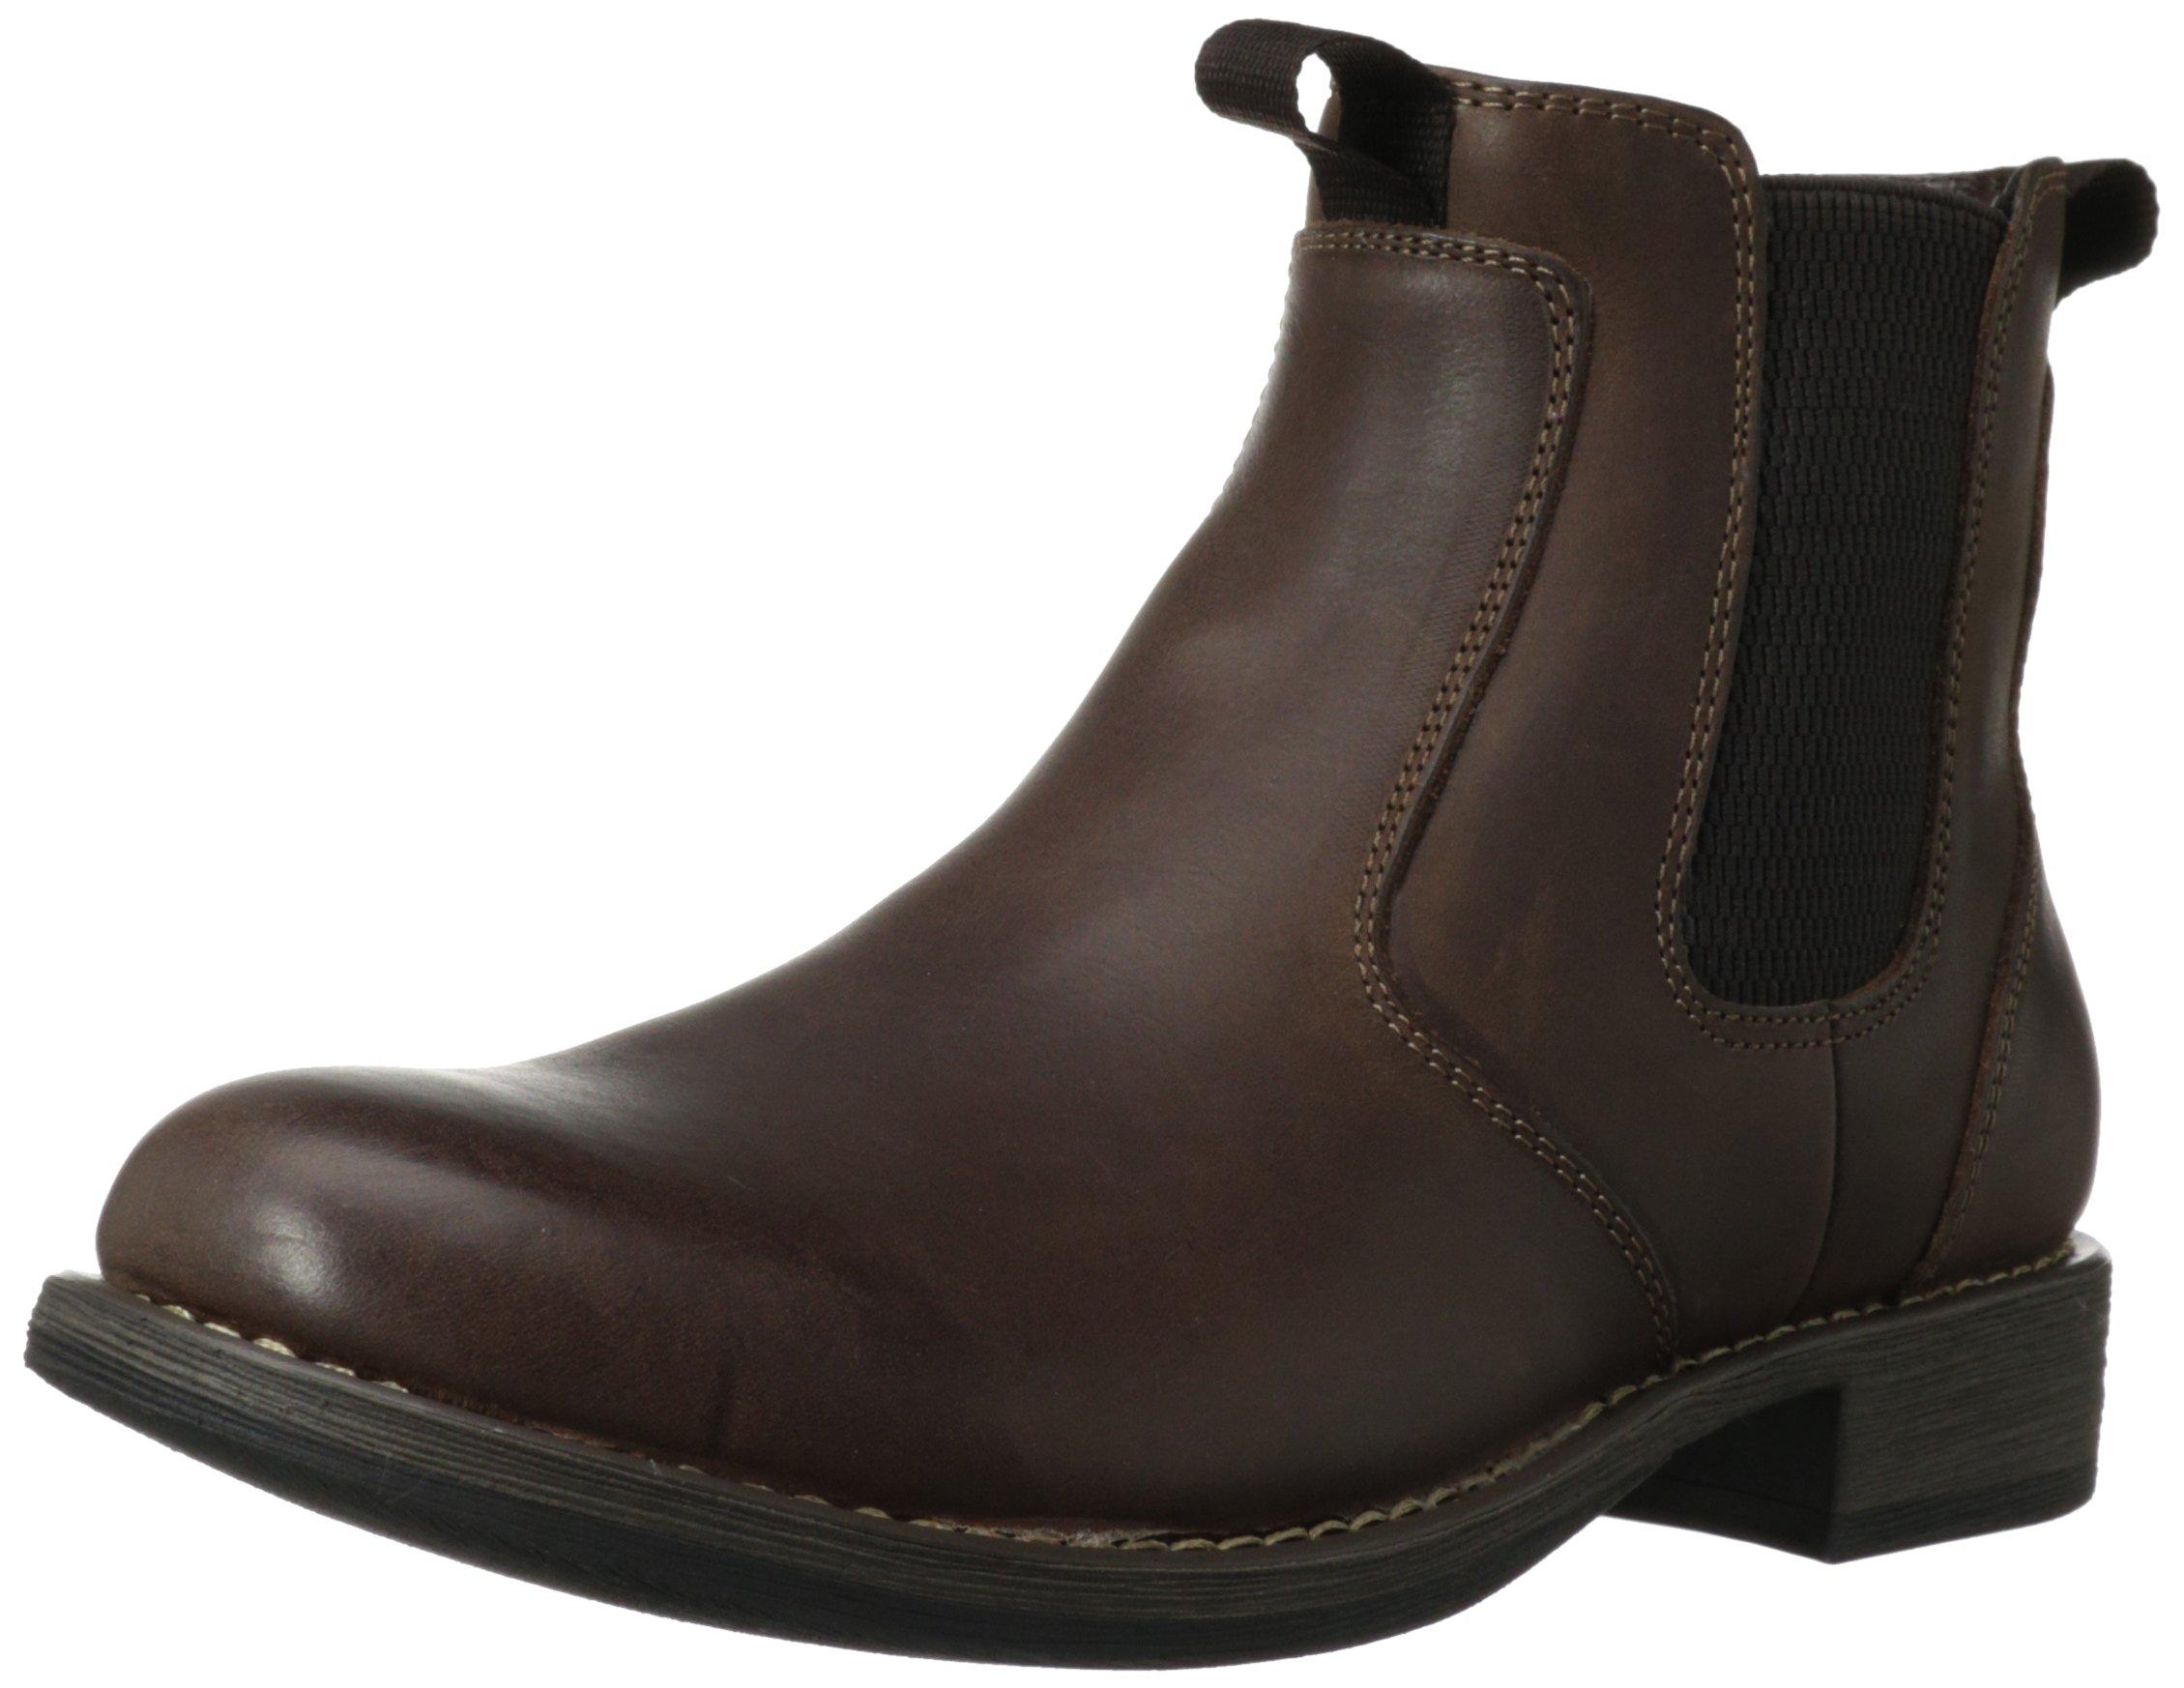 Eastland Men's Daily Double Chelsea Boot, Dark Brown, 8.5 D US